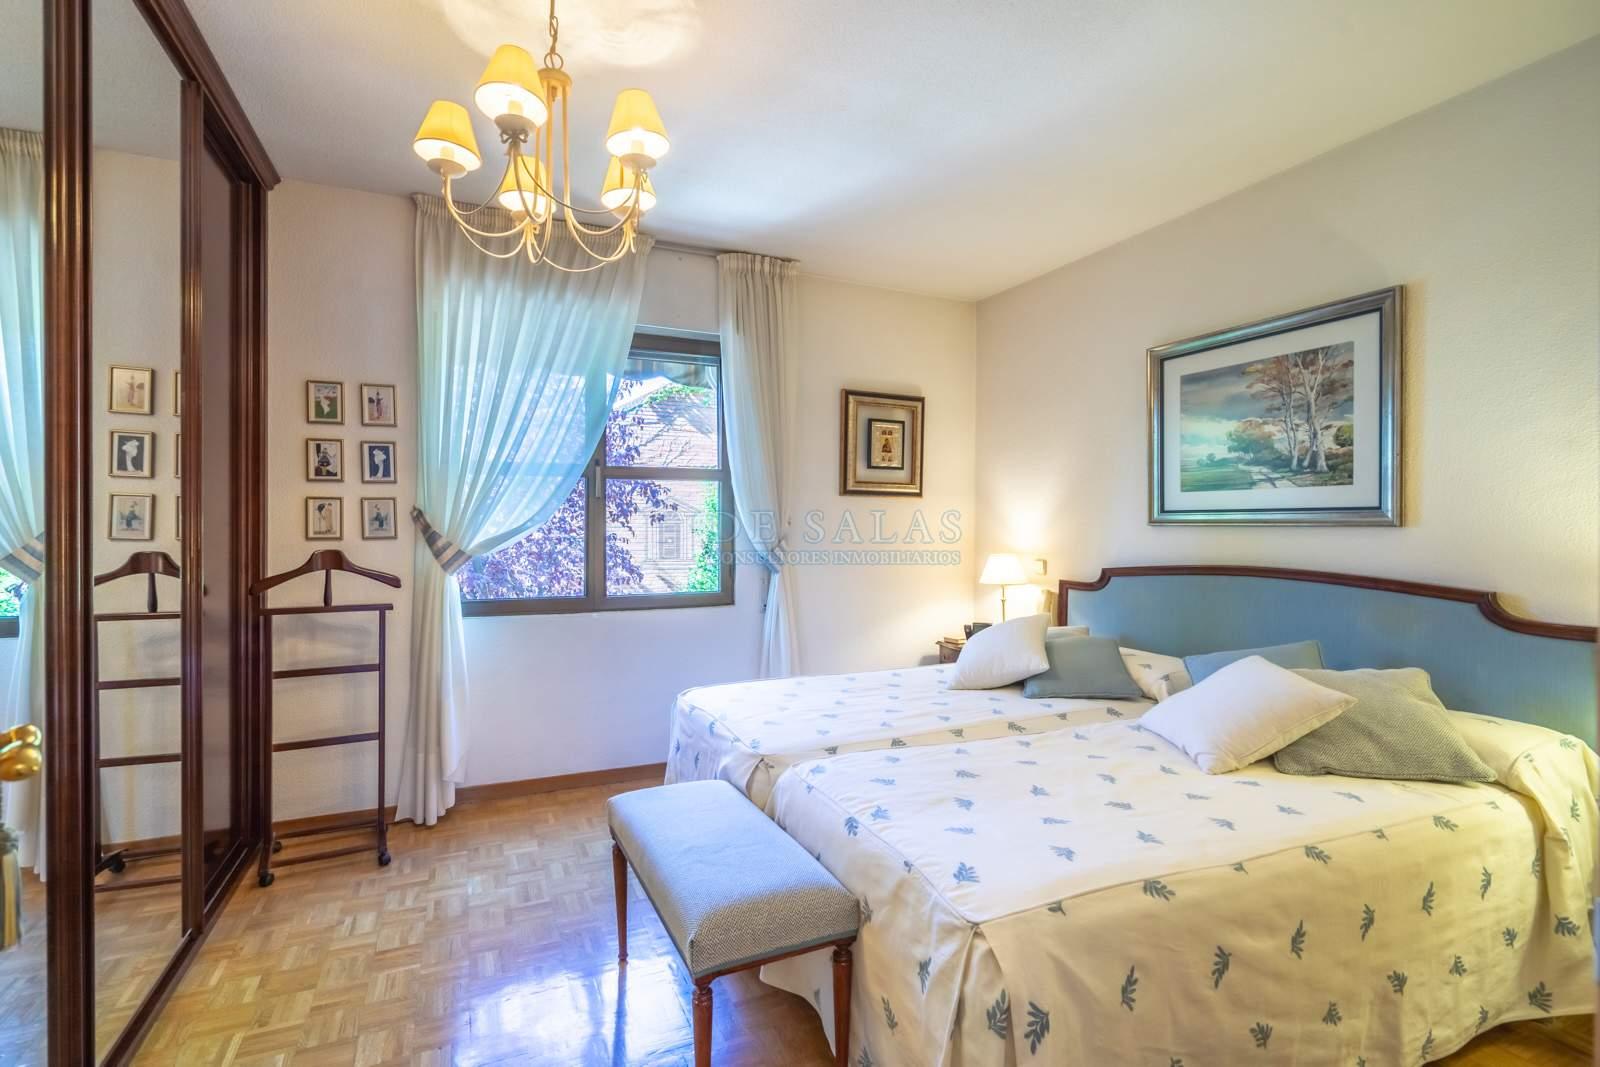 Dormitorio-21 Chalet Soto de la Moraleja